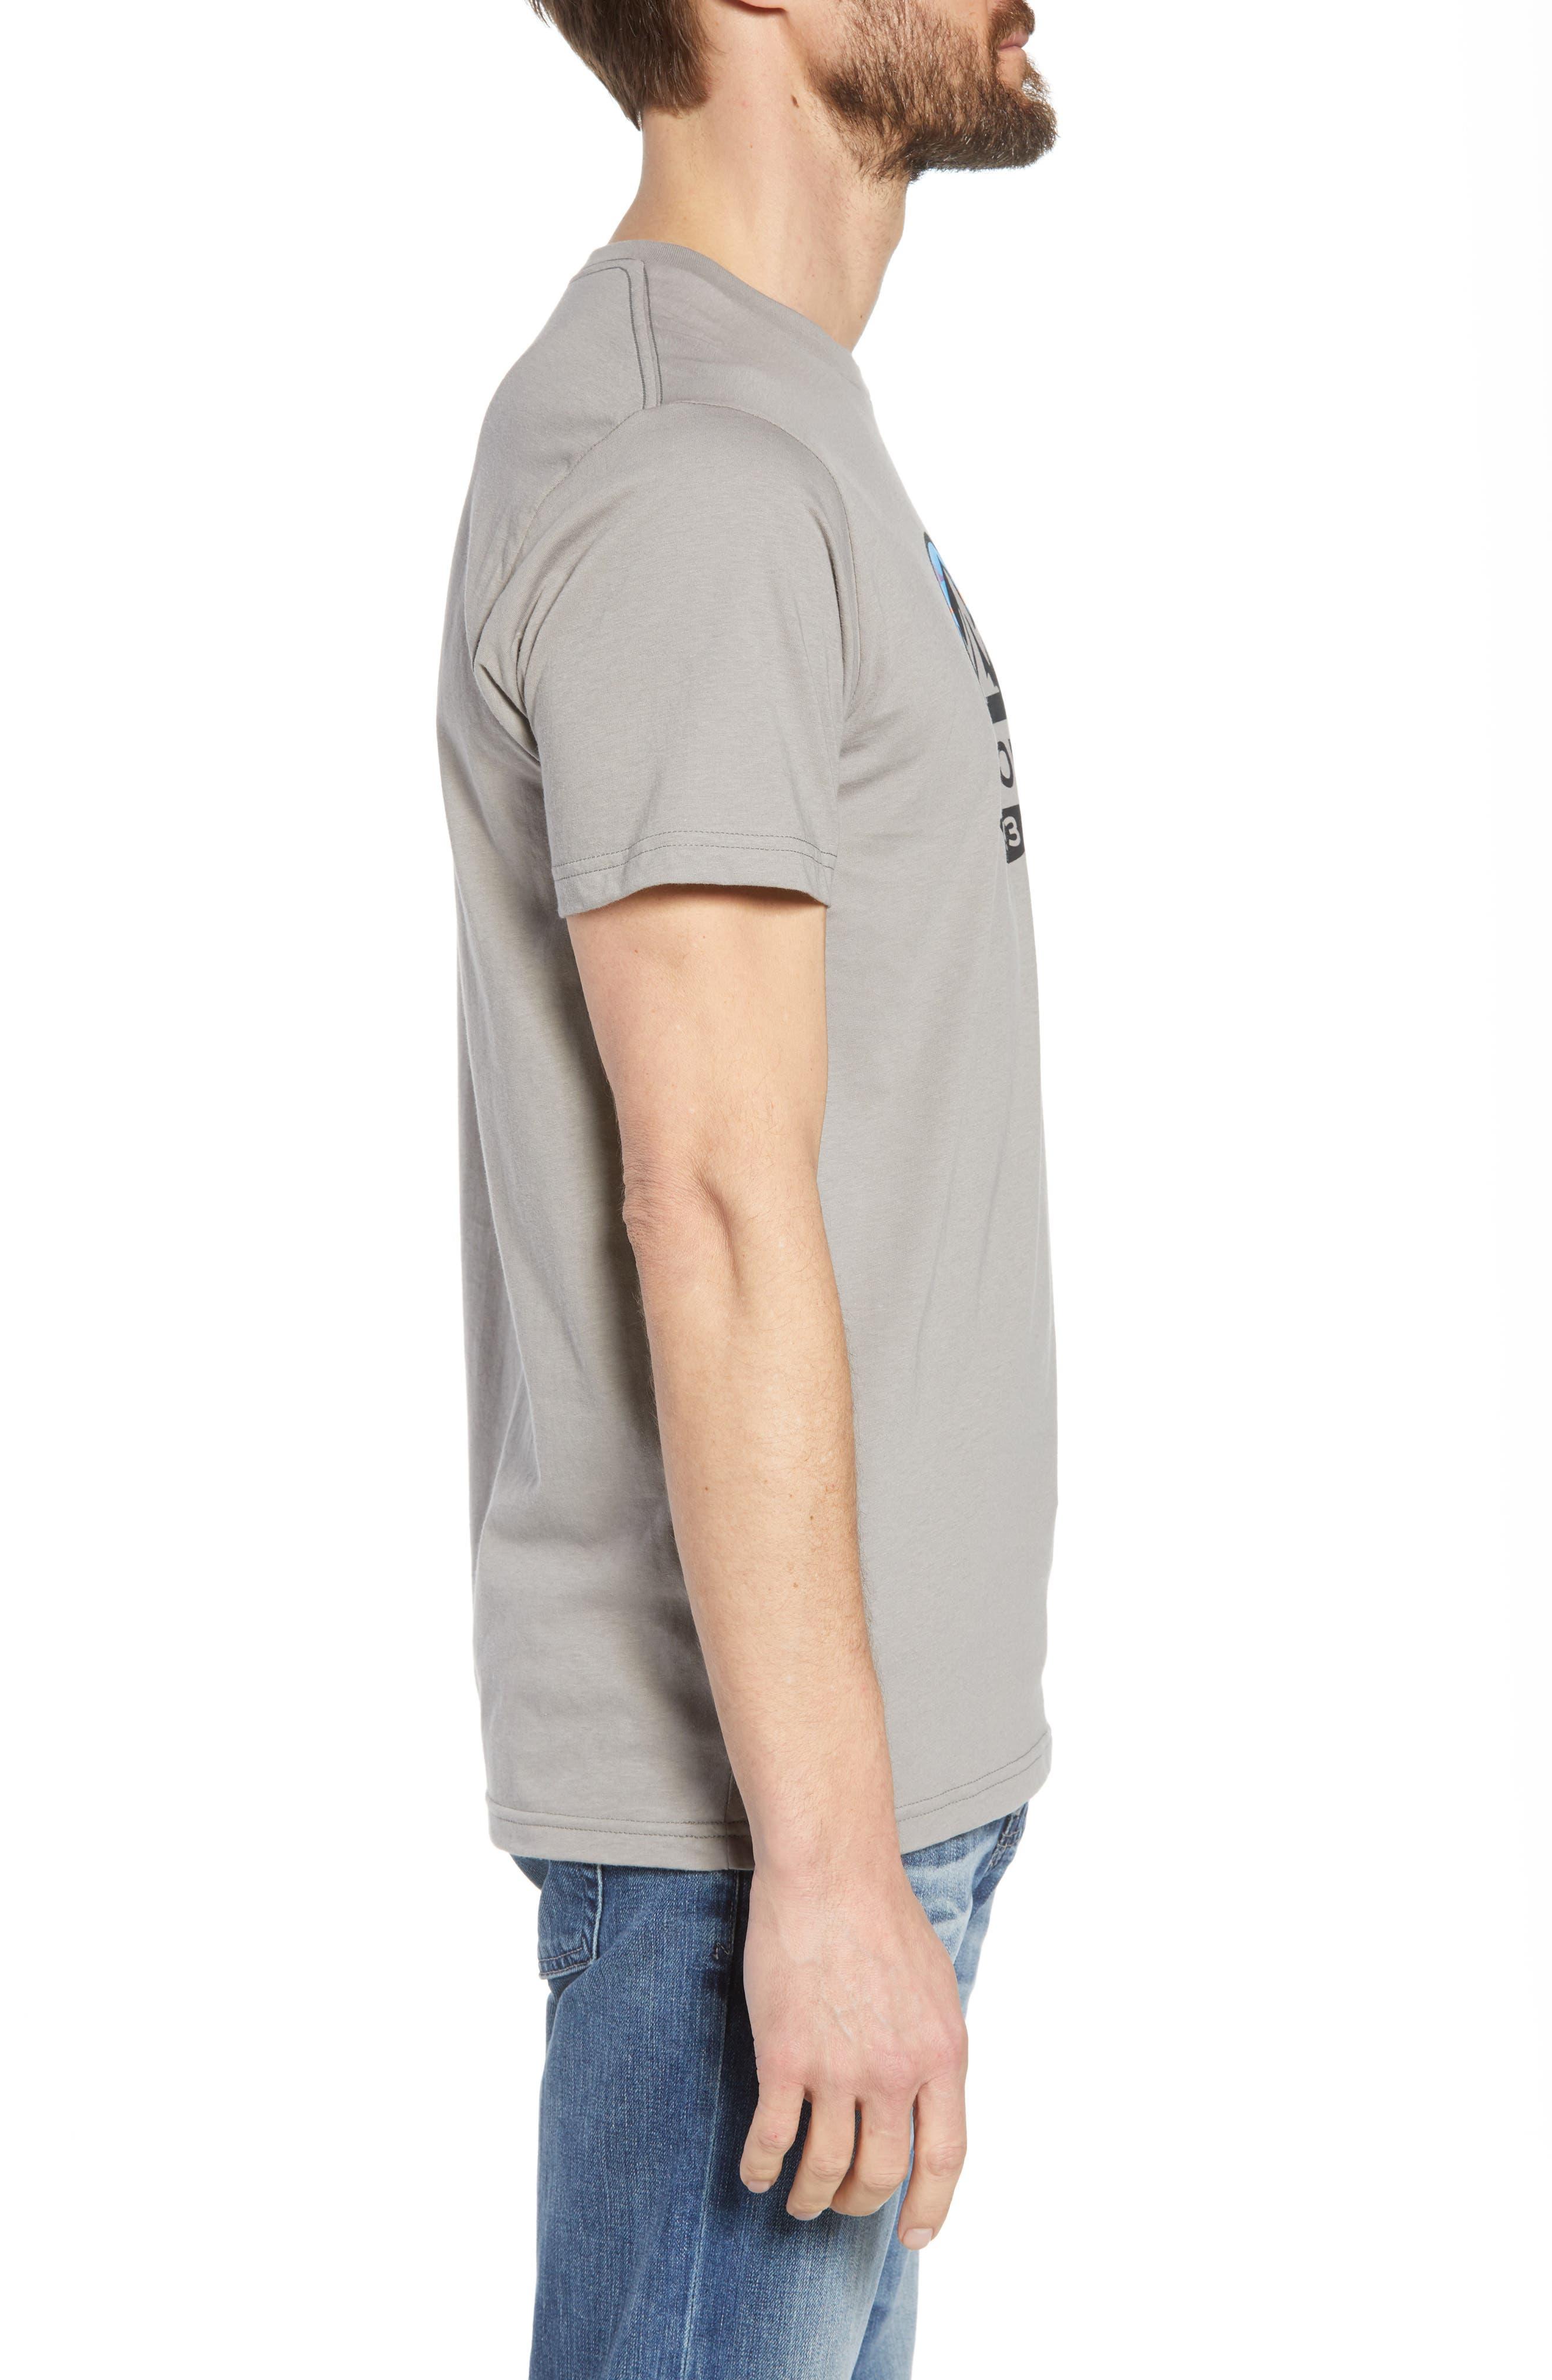 PATAGONIA, Fitz Roy Scope Crewneck T-Shirt, Alternate thumbnail 3, color, FEATHER GREY